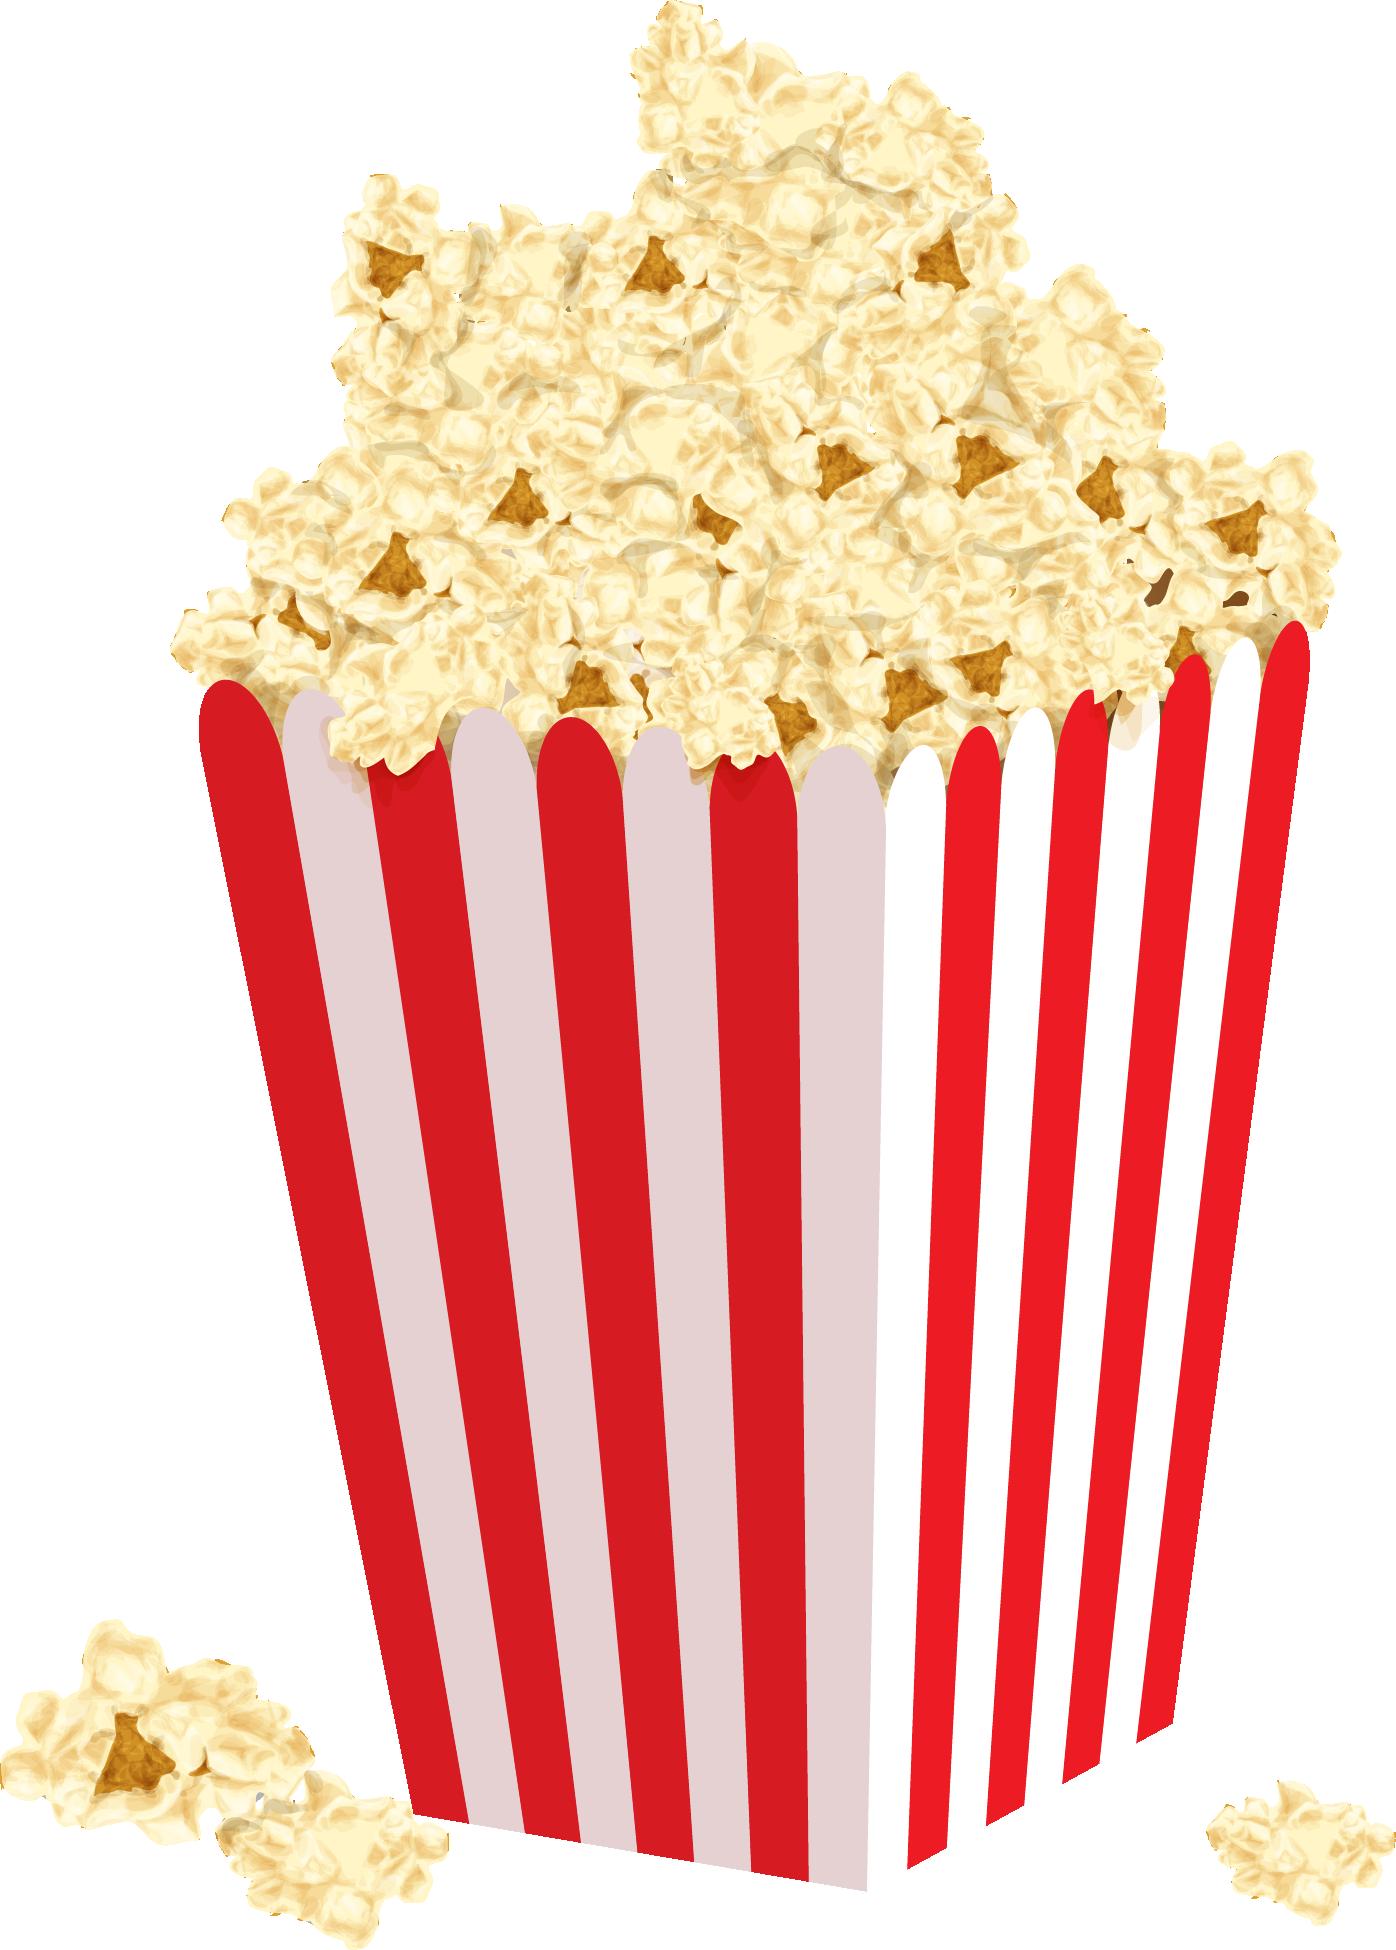 Pocorn clipart clip royalty free Popcorn Box Clipart Png – Clipartly.com clip royalty free